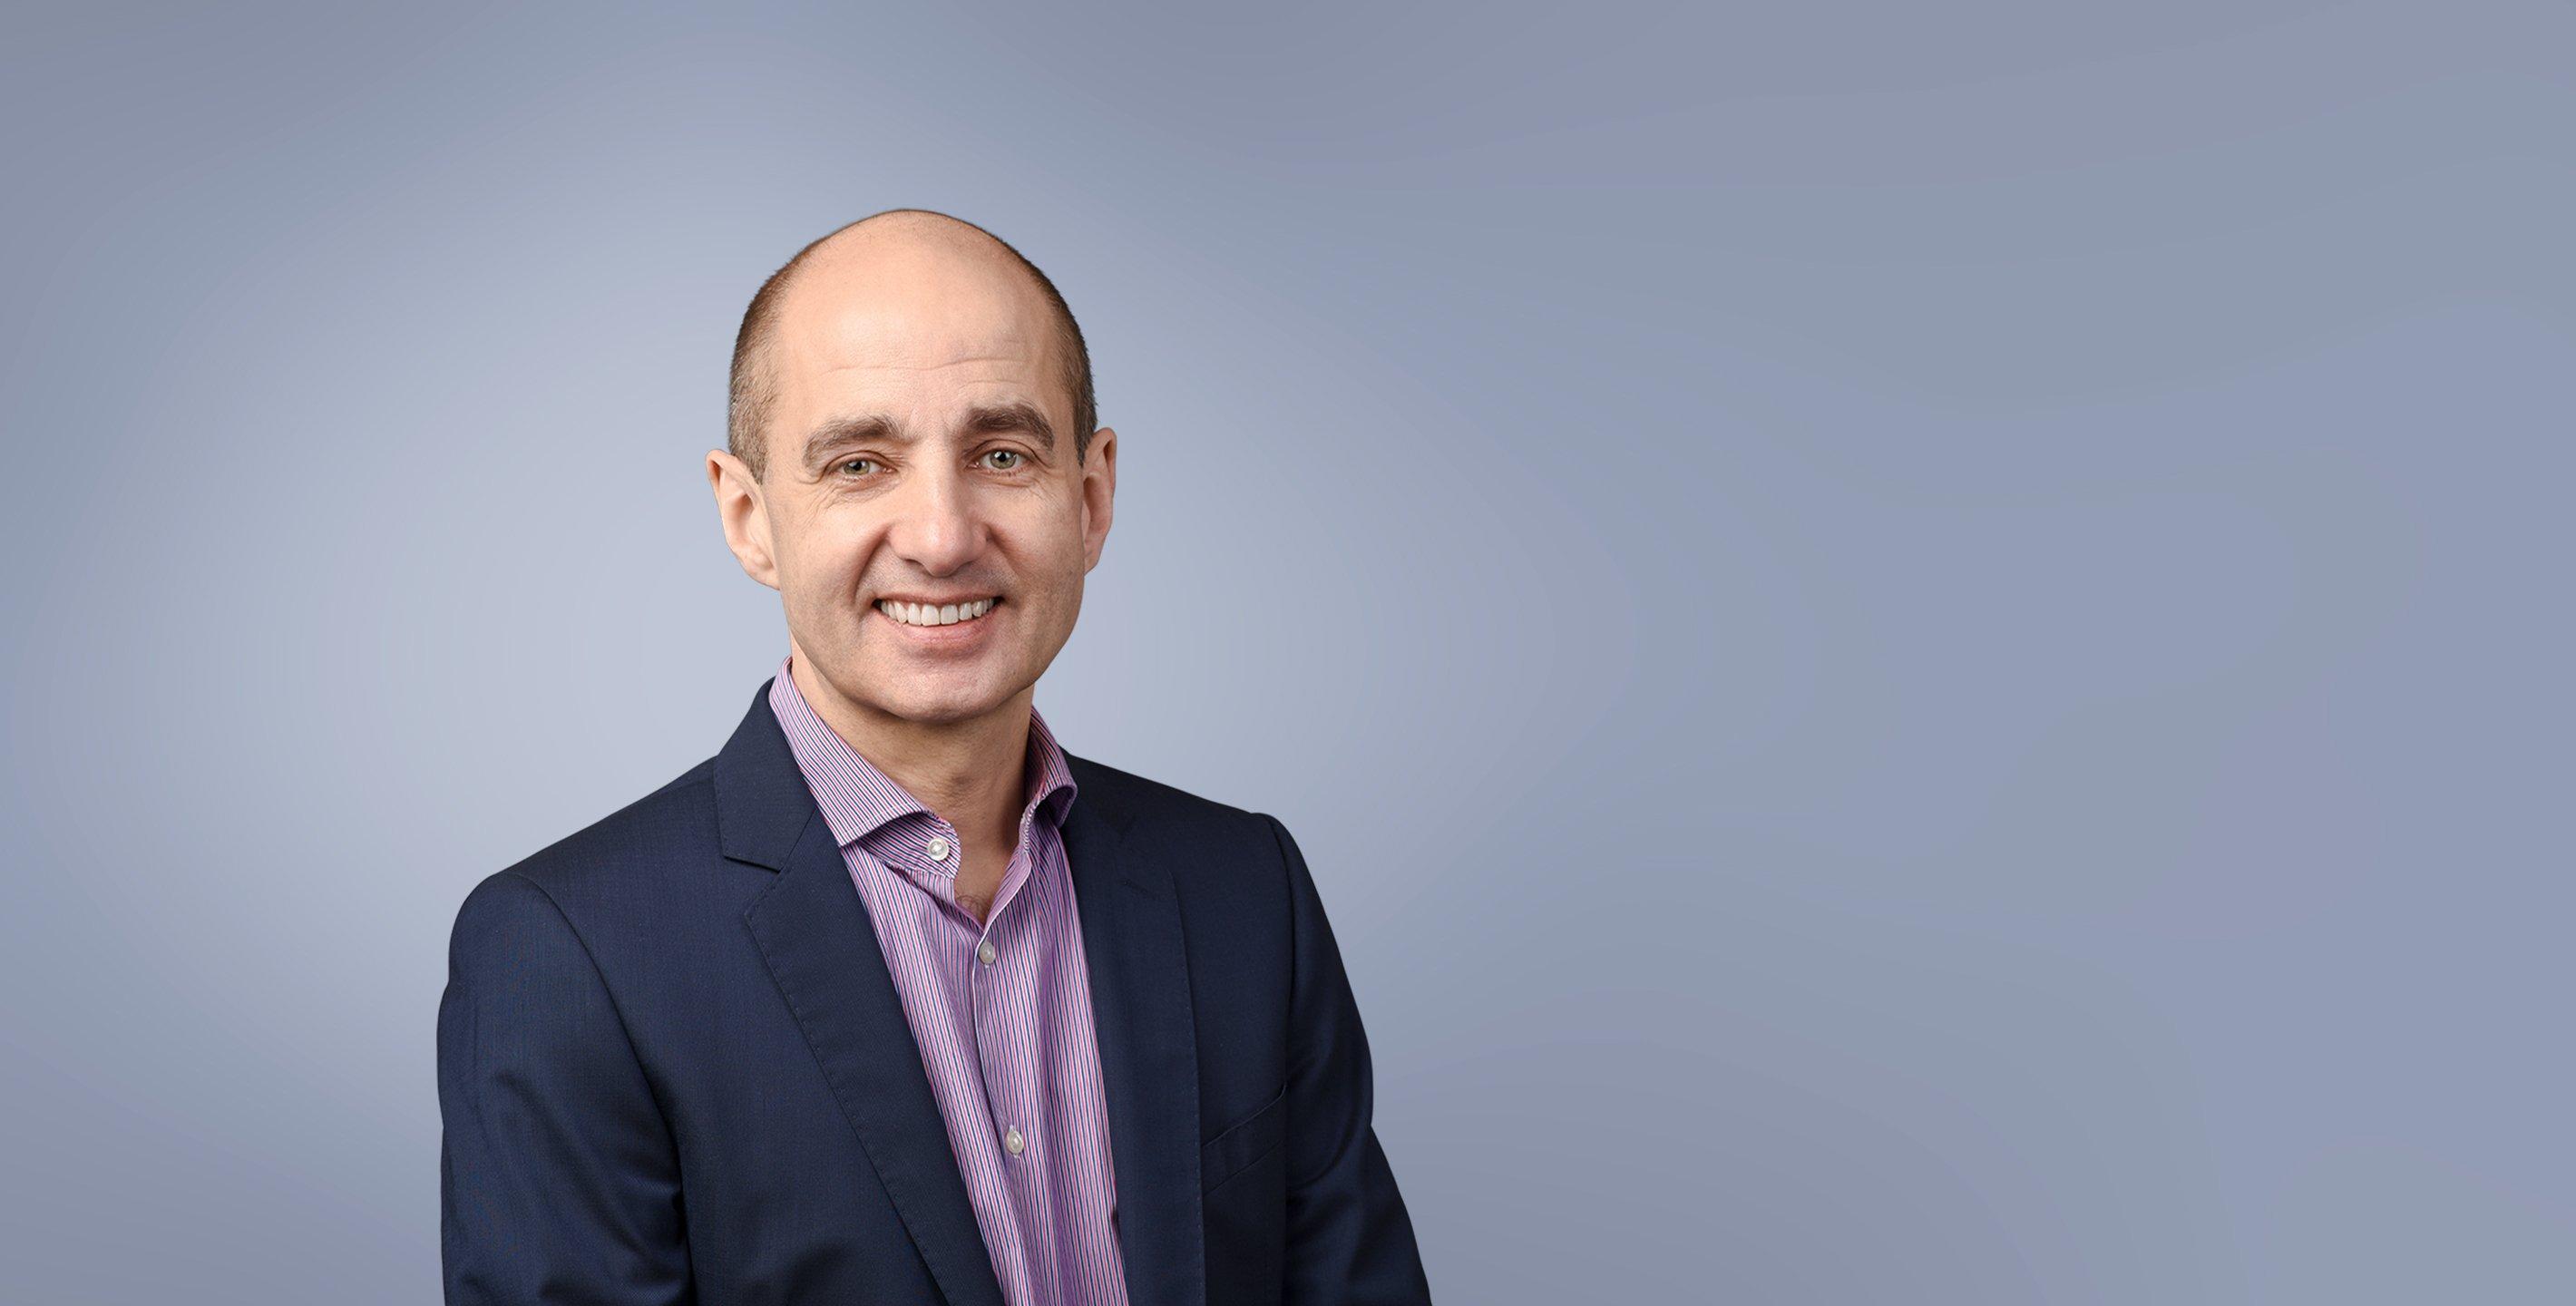 Robert Scherrer - Management Consultant und Certified Partner - Project Competence – Digitale Transformationen, IT-Strategie, Coaching, in Business-Attire